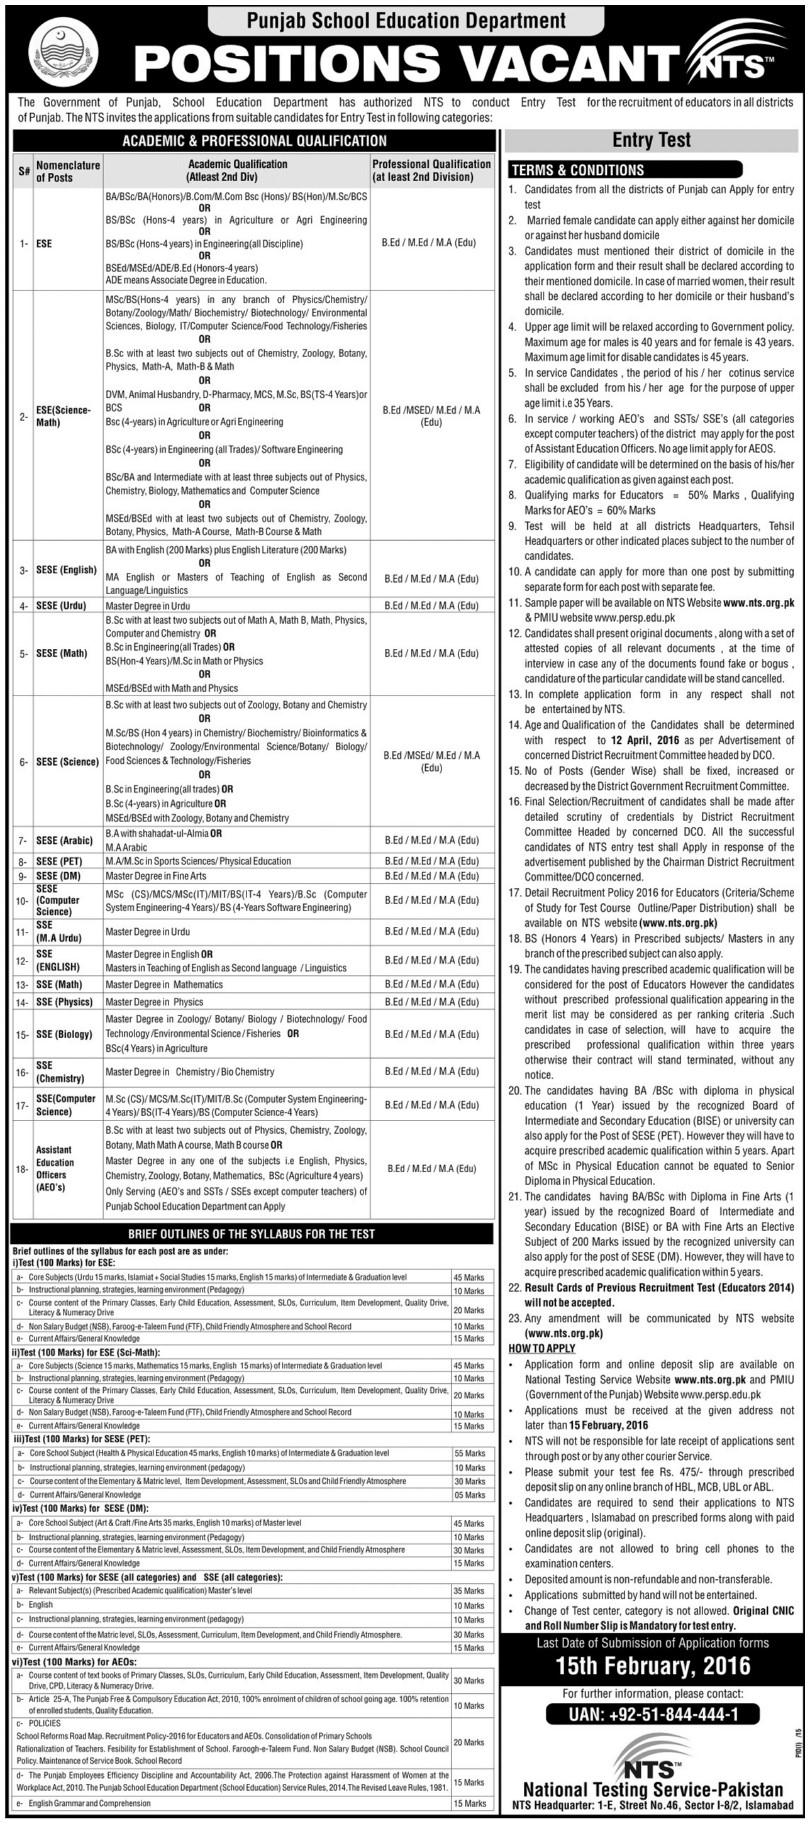 NTS Punjab School Education Department Teachers Jobs